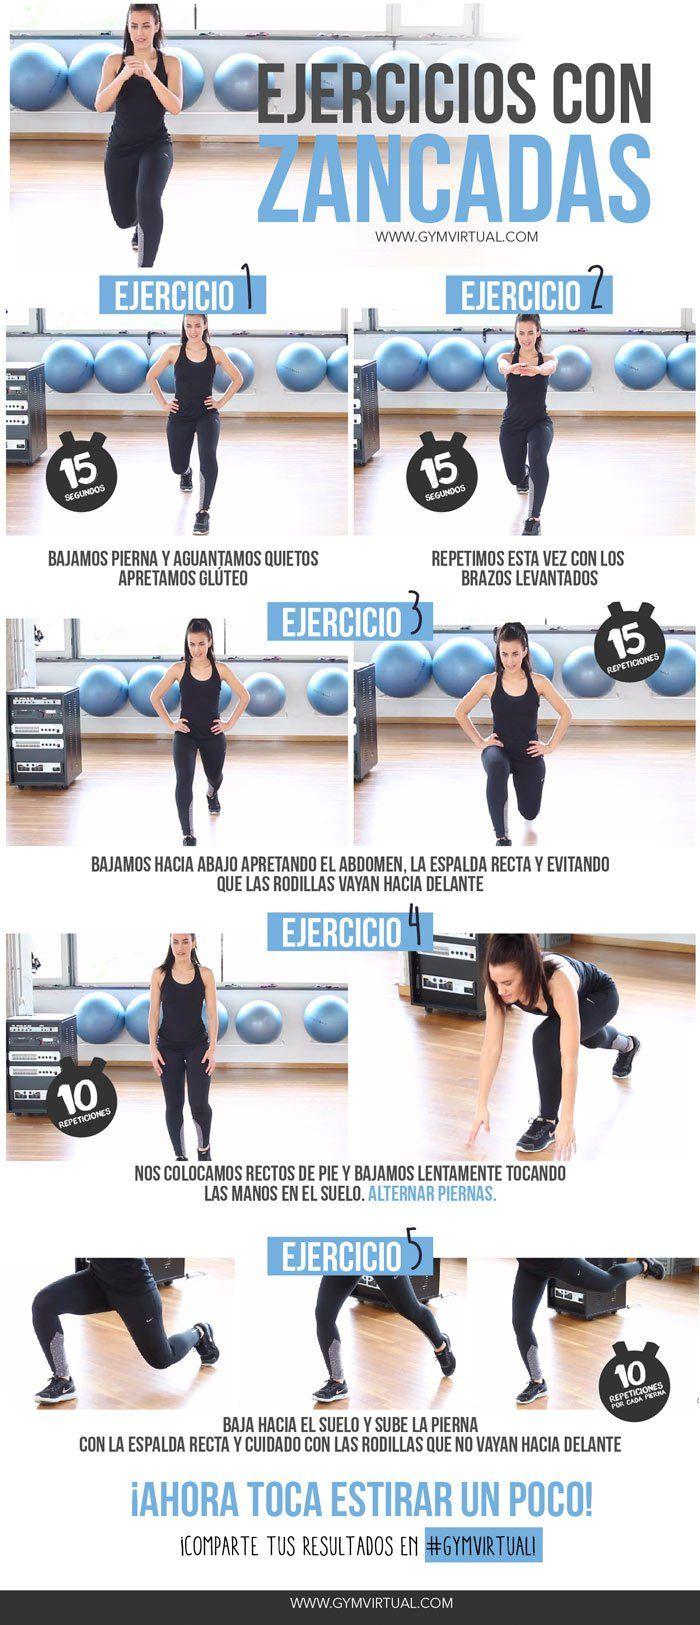 Dieta para tener piernas gruesas